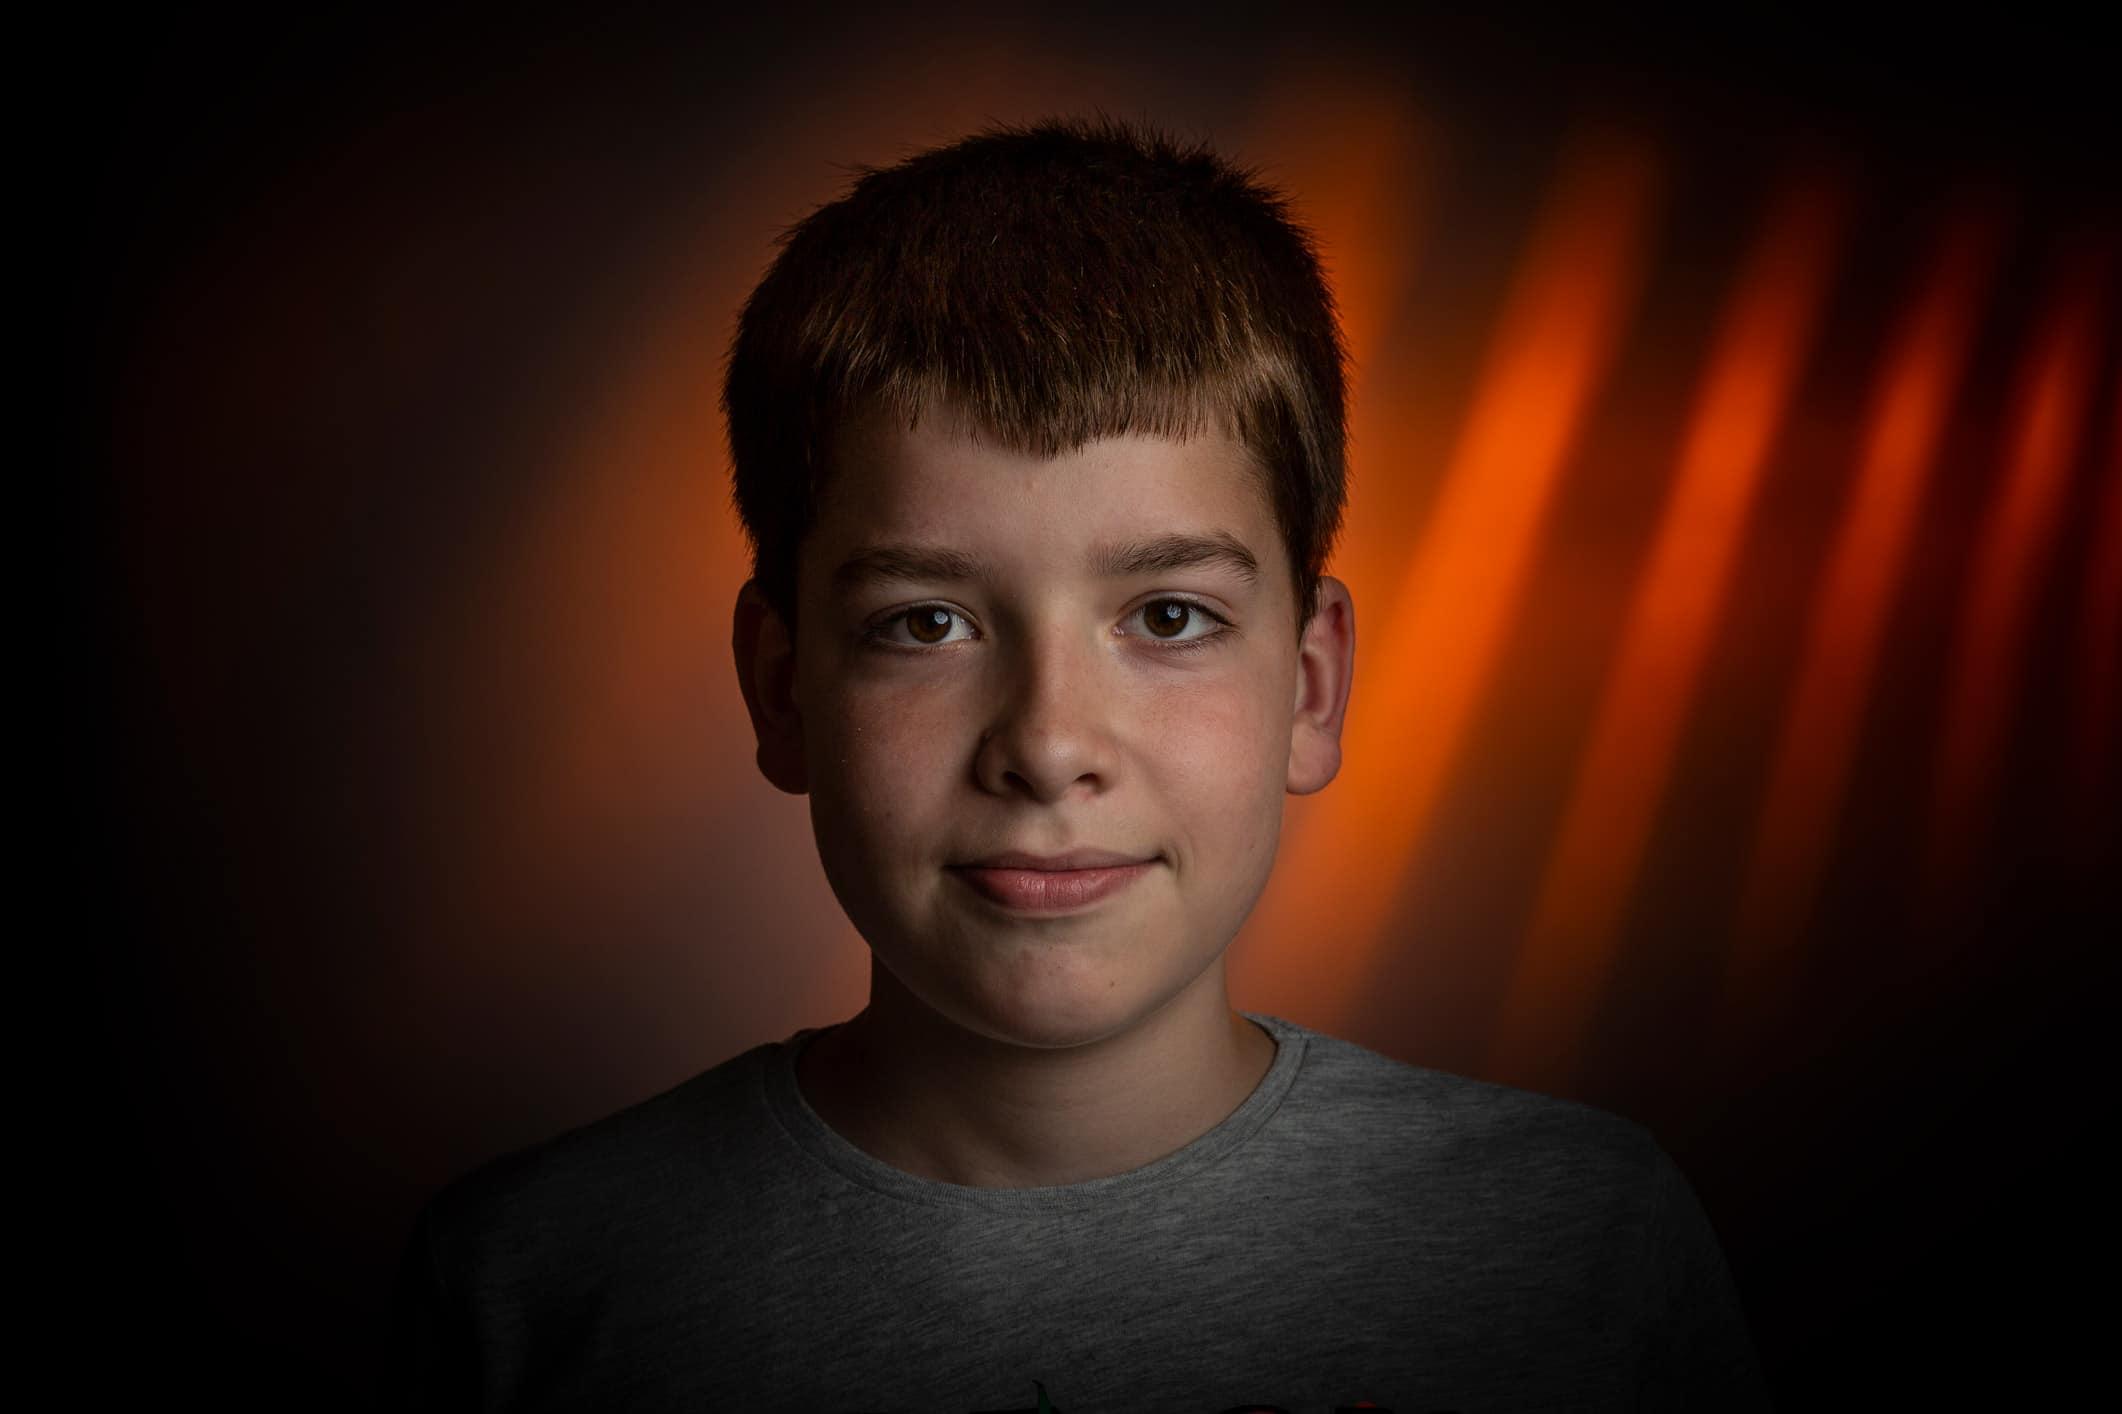 portret fotostudio Nieuw-Vennep